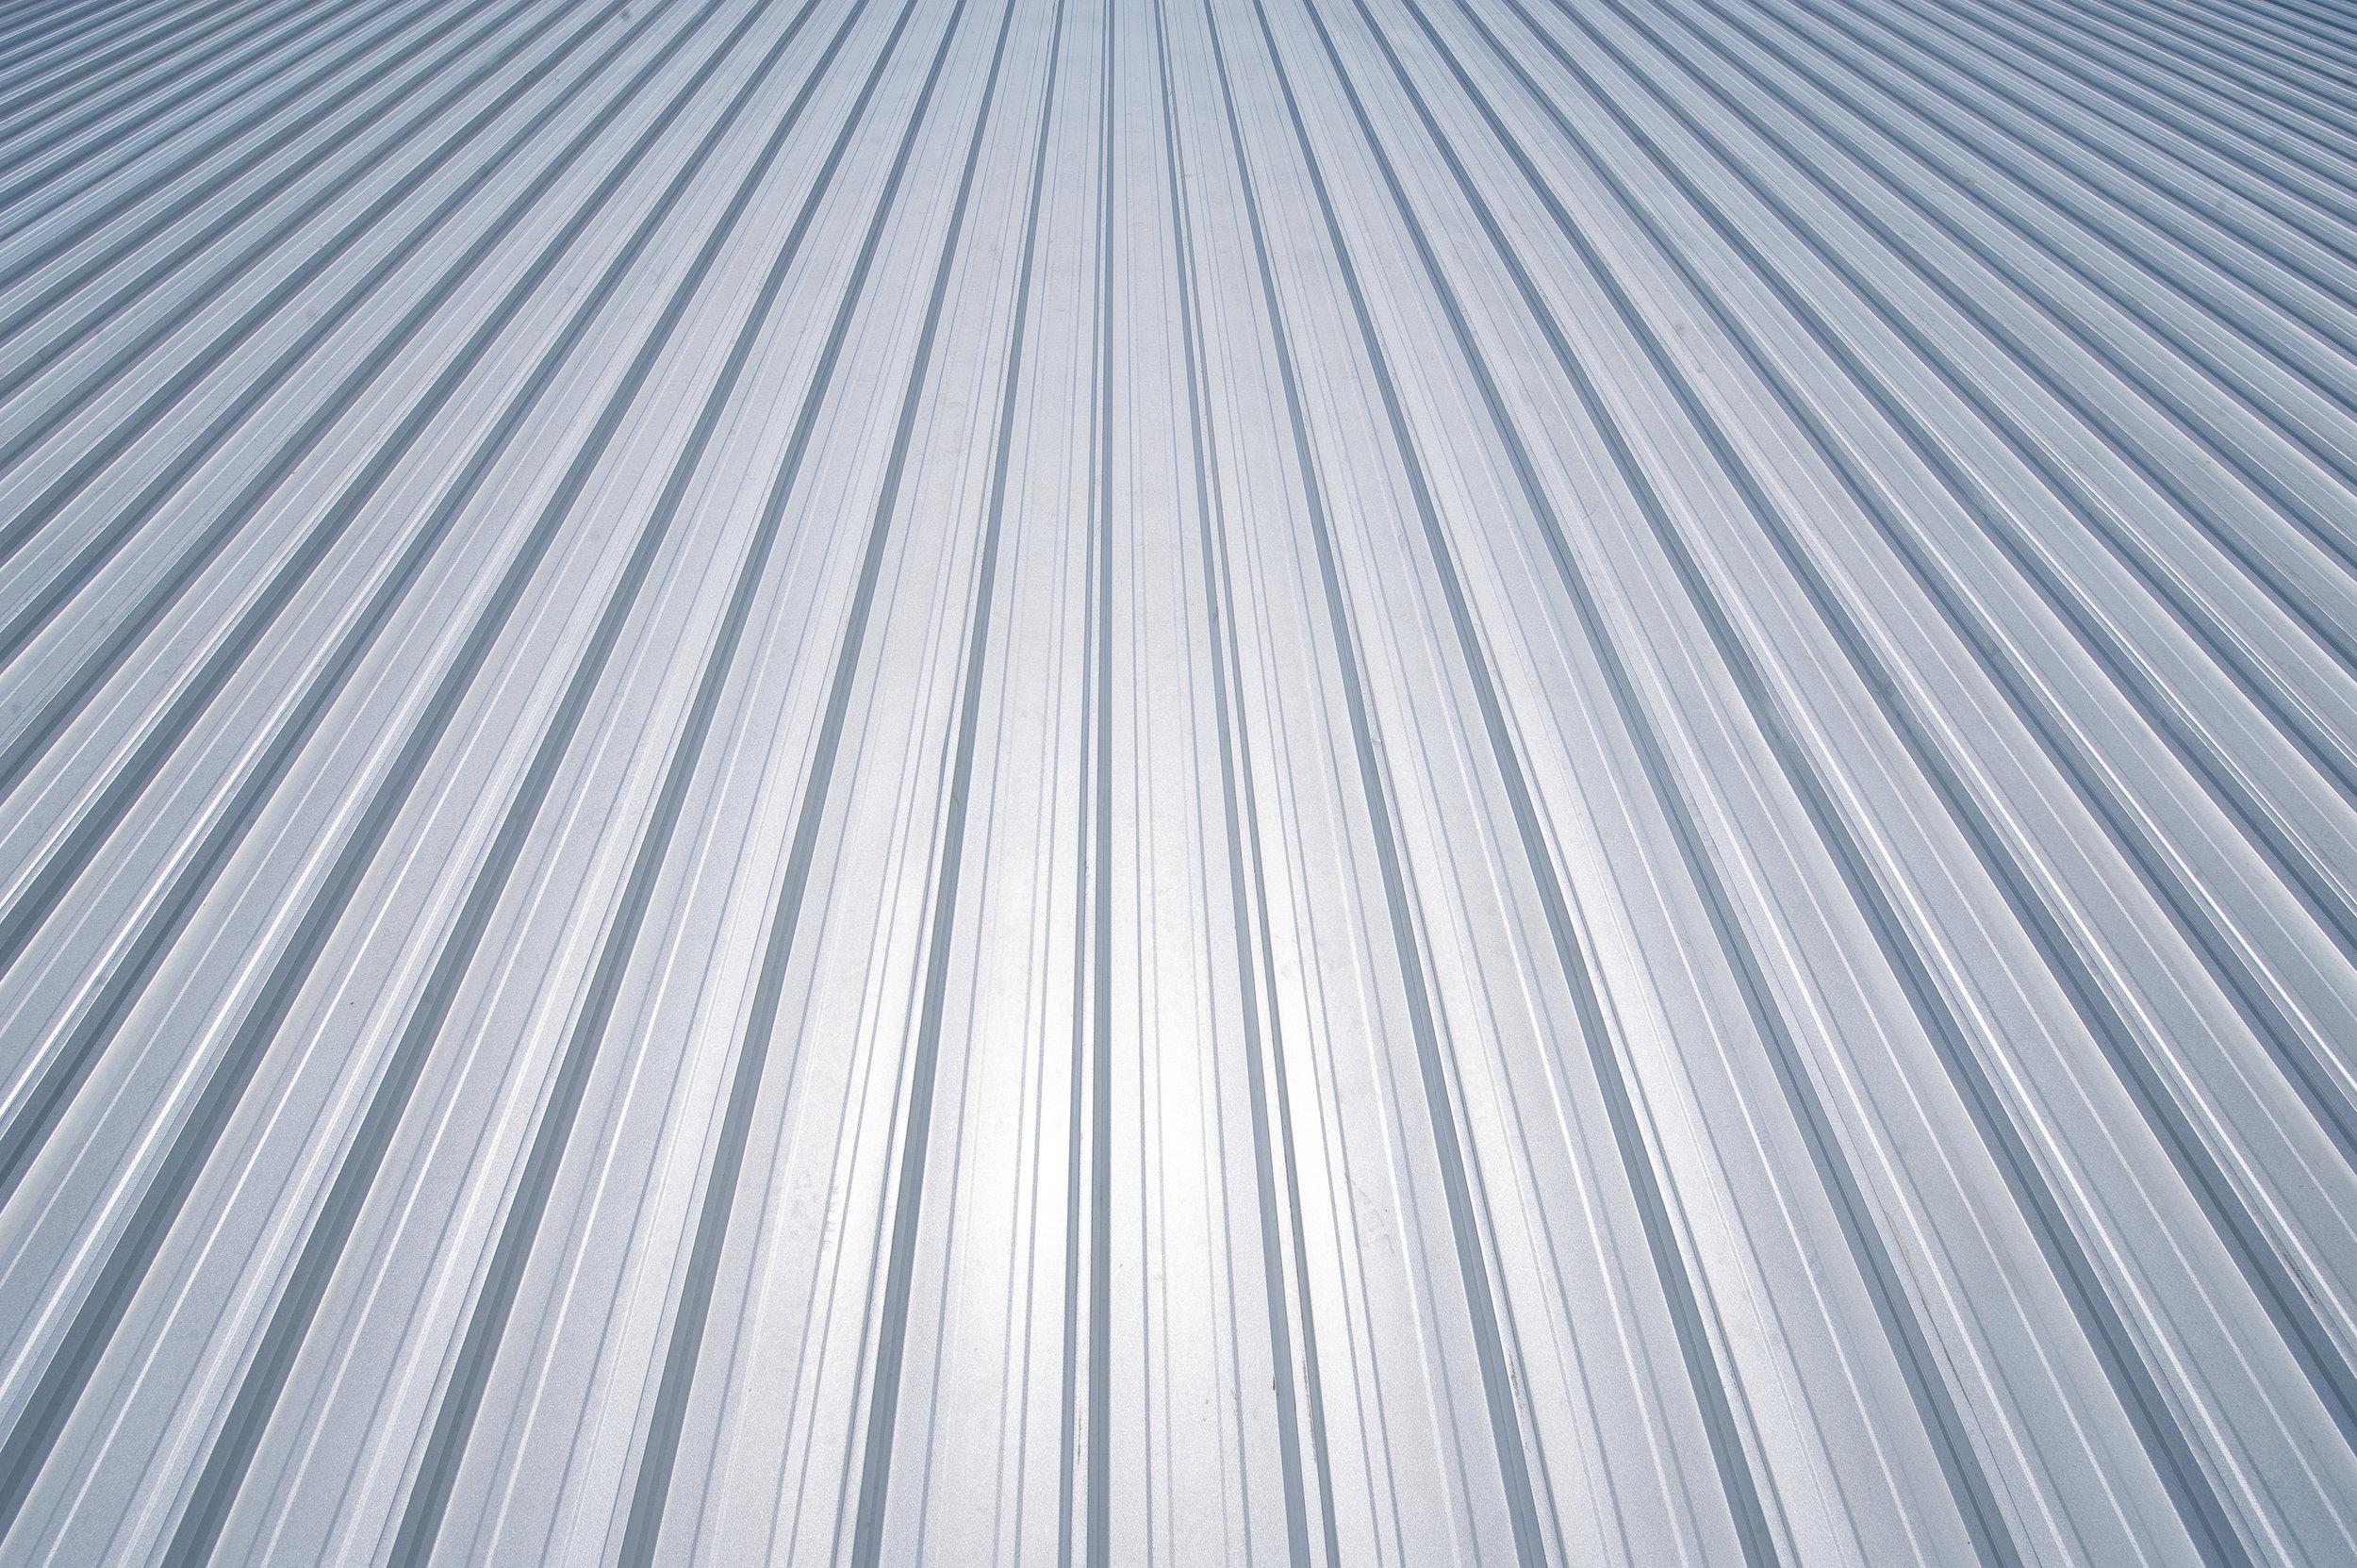 Corrugated-Metal-Cladding.jpg